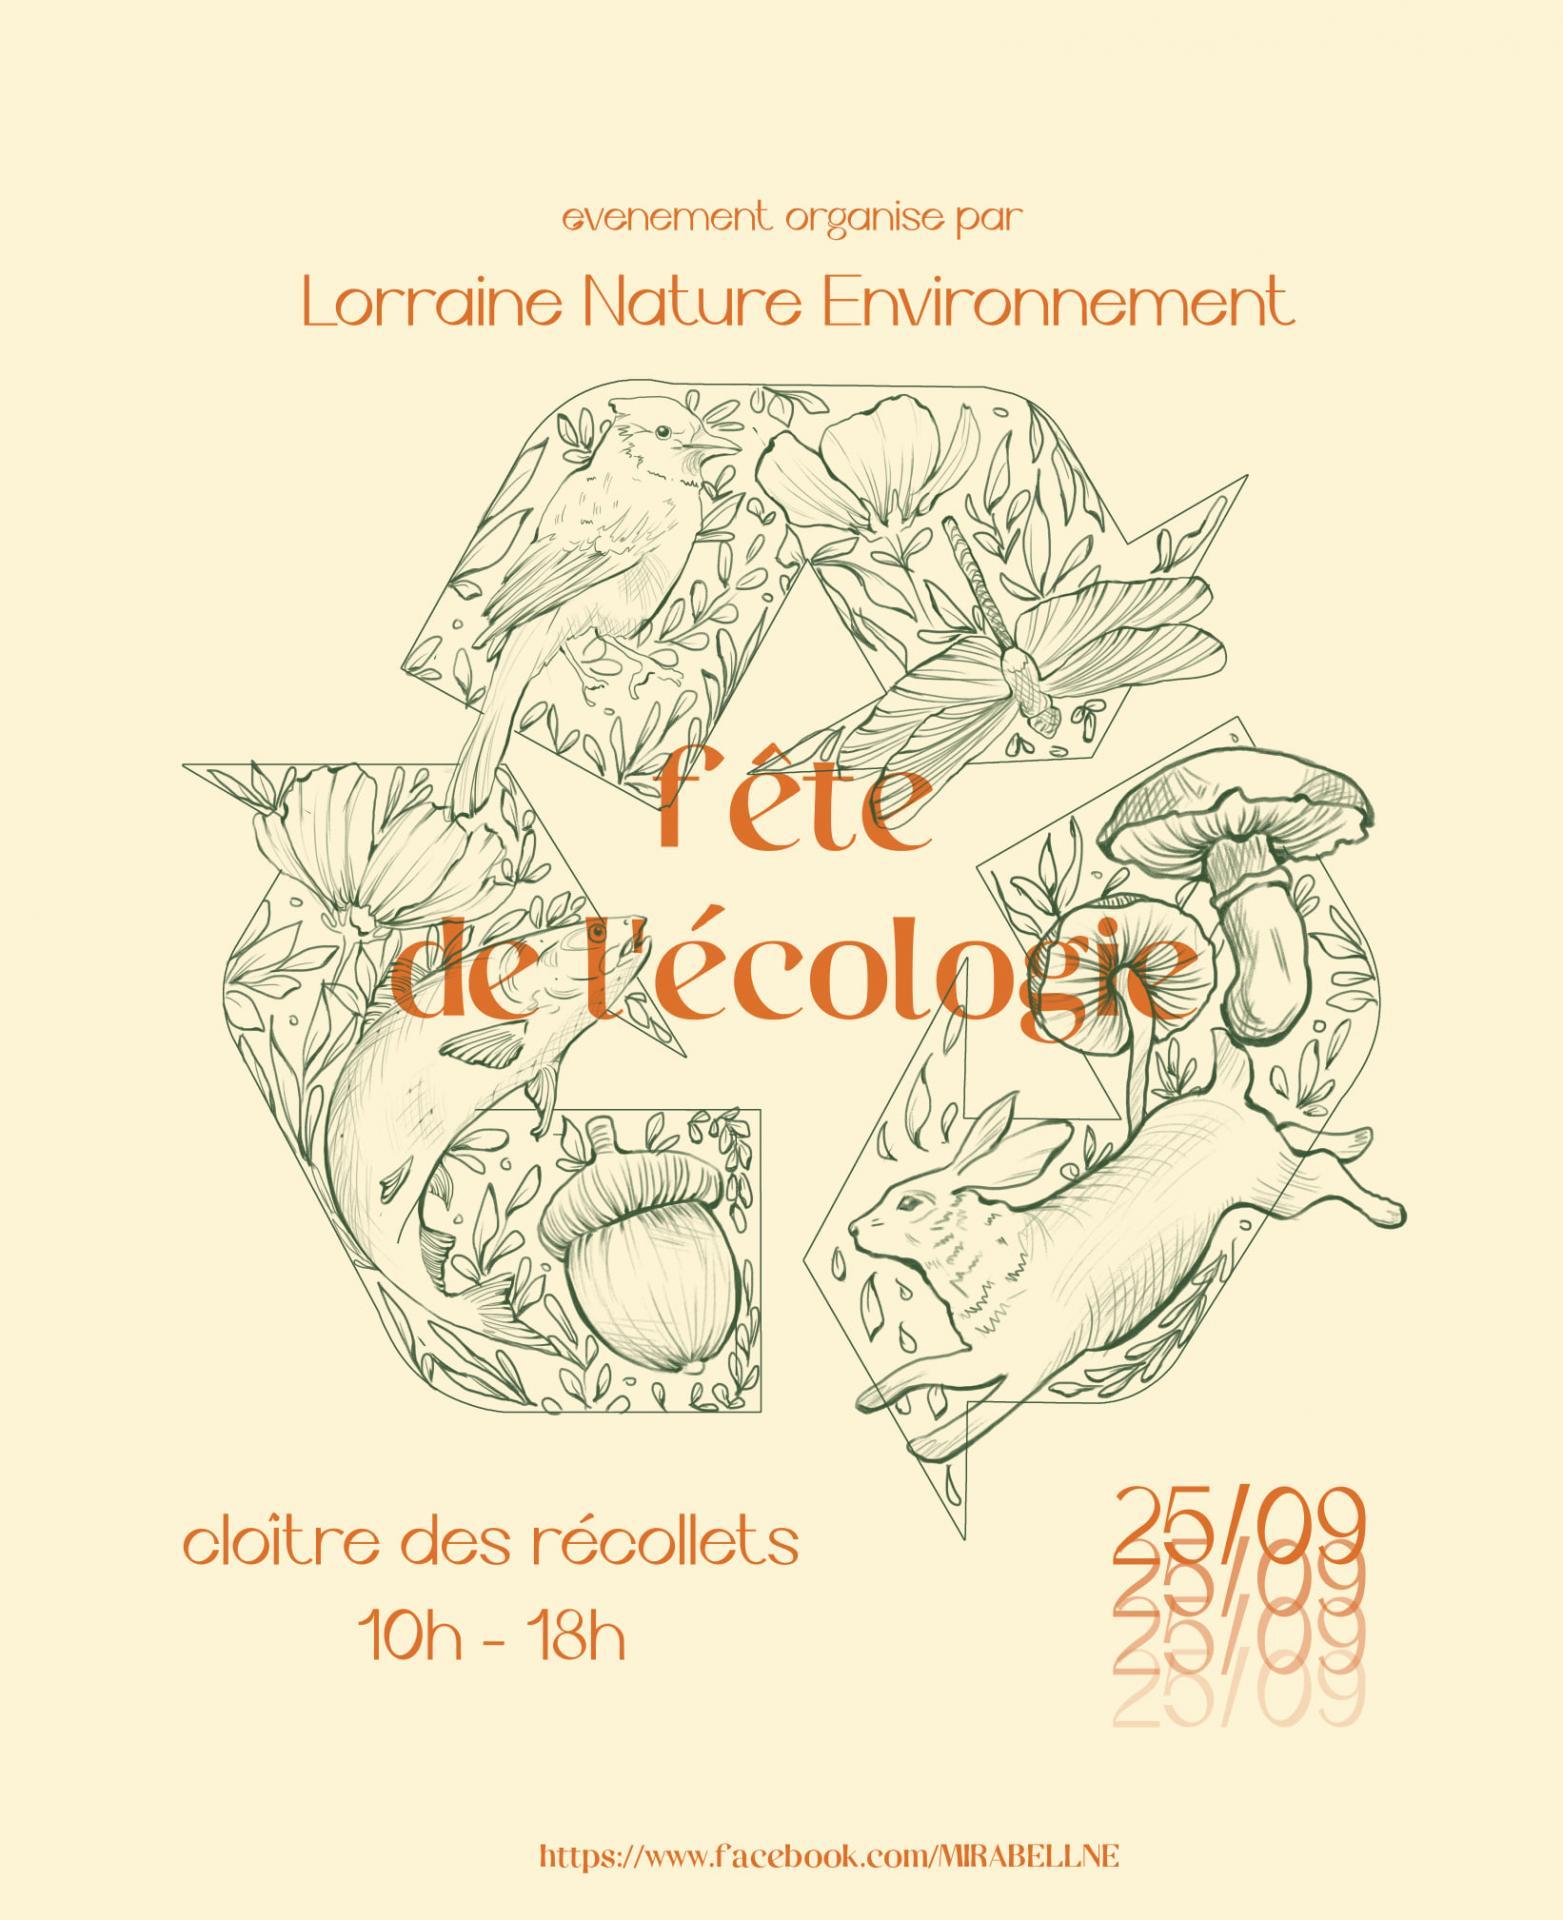 Fete ecologie 2021